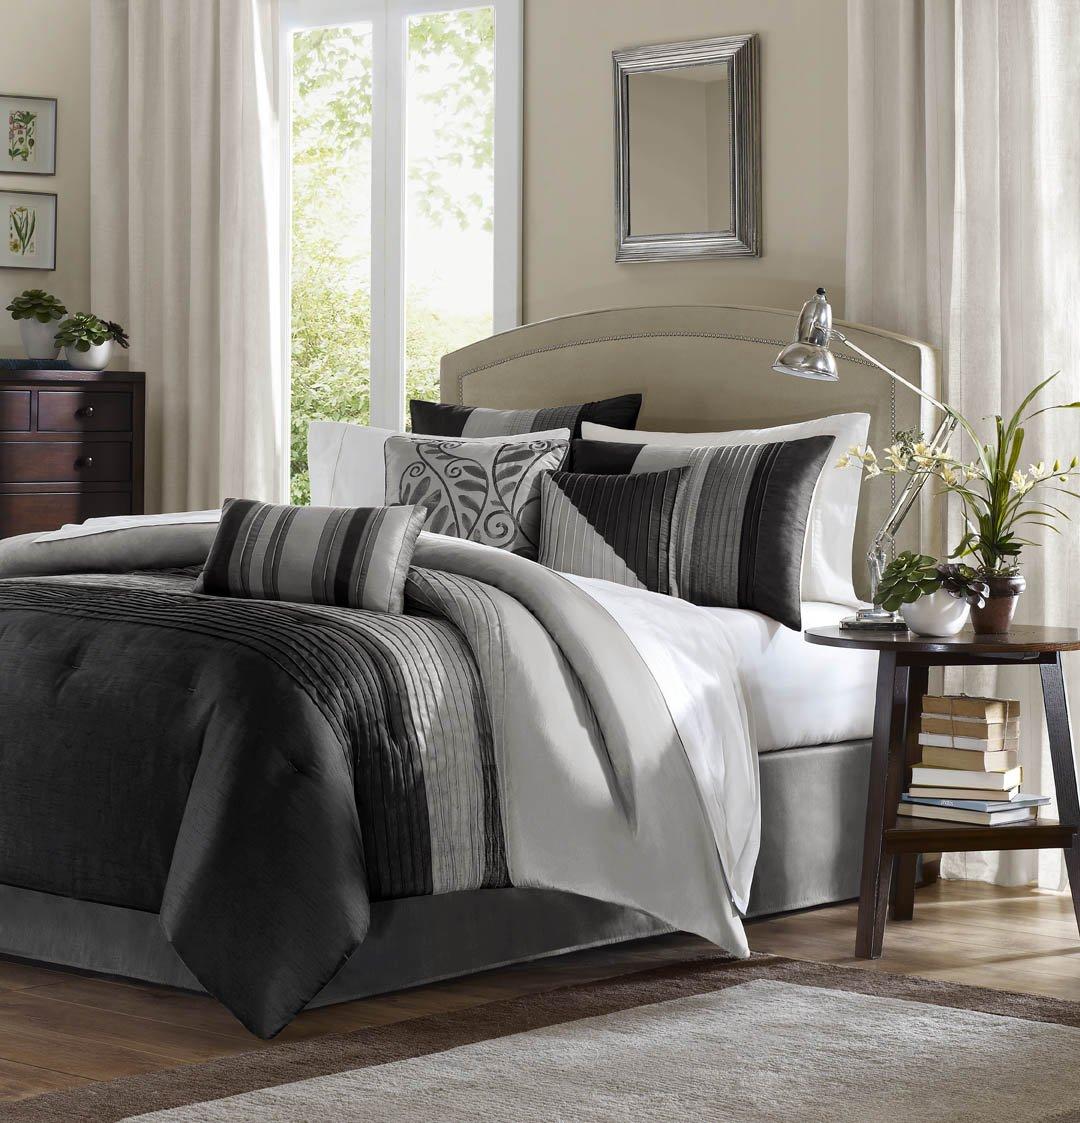 Madison Park Amherst Full Size Bed Comforter Set Bed In A Bag - Black, Grey, Pieced Stripes – 7 Pieces Bedding Sets – Ultra Soft Microfiber Bedroom Comforters